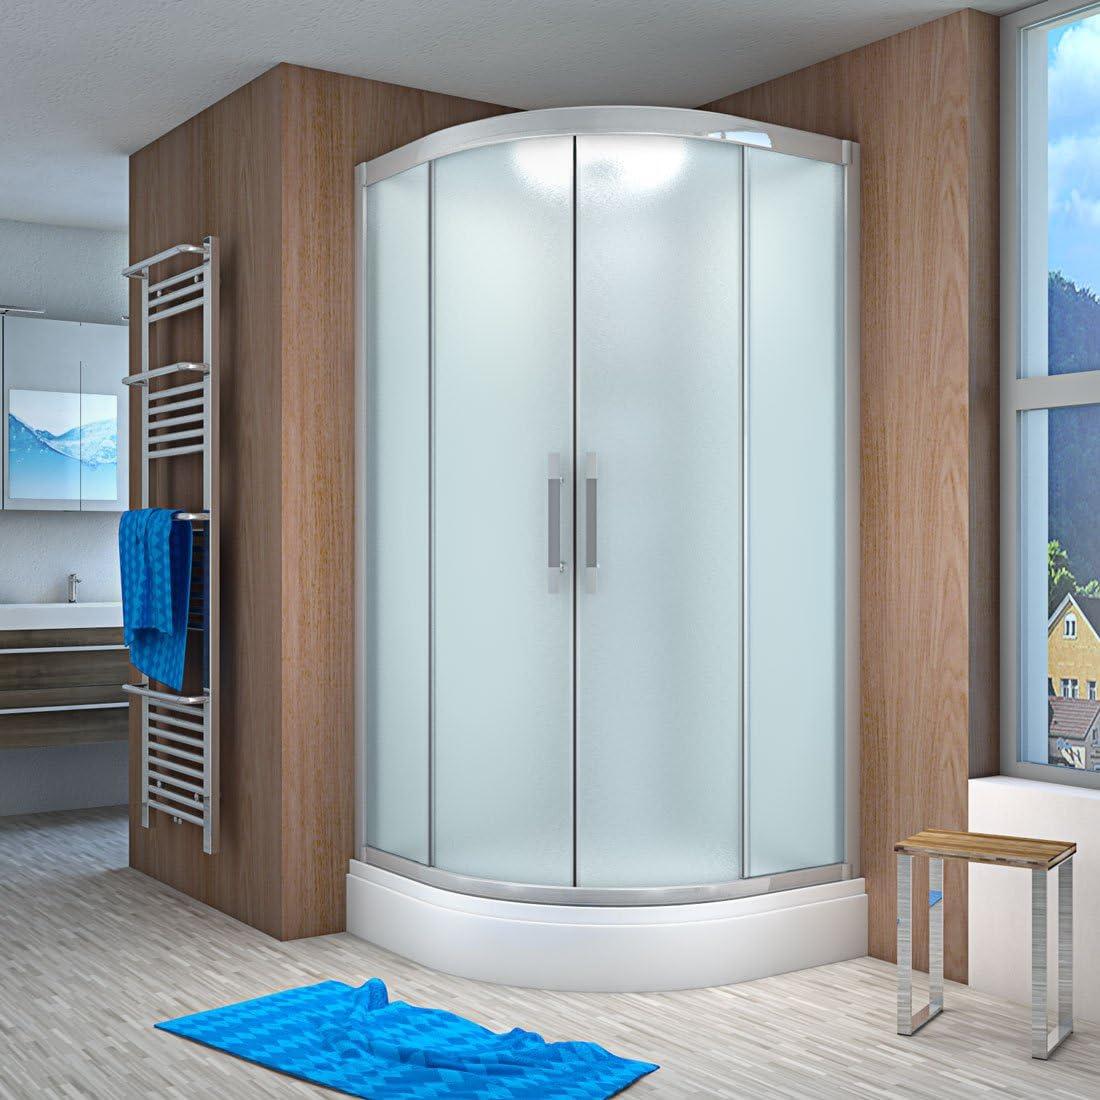 Acqua Vapore quick26 – 1014 ducha ducha Templo completa cabinas de ducha 90 x 90 20.00 wattsW, 230.00 voltsV: Amazon.es: Bricolaje y herramientas